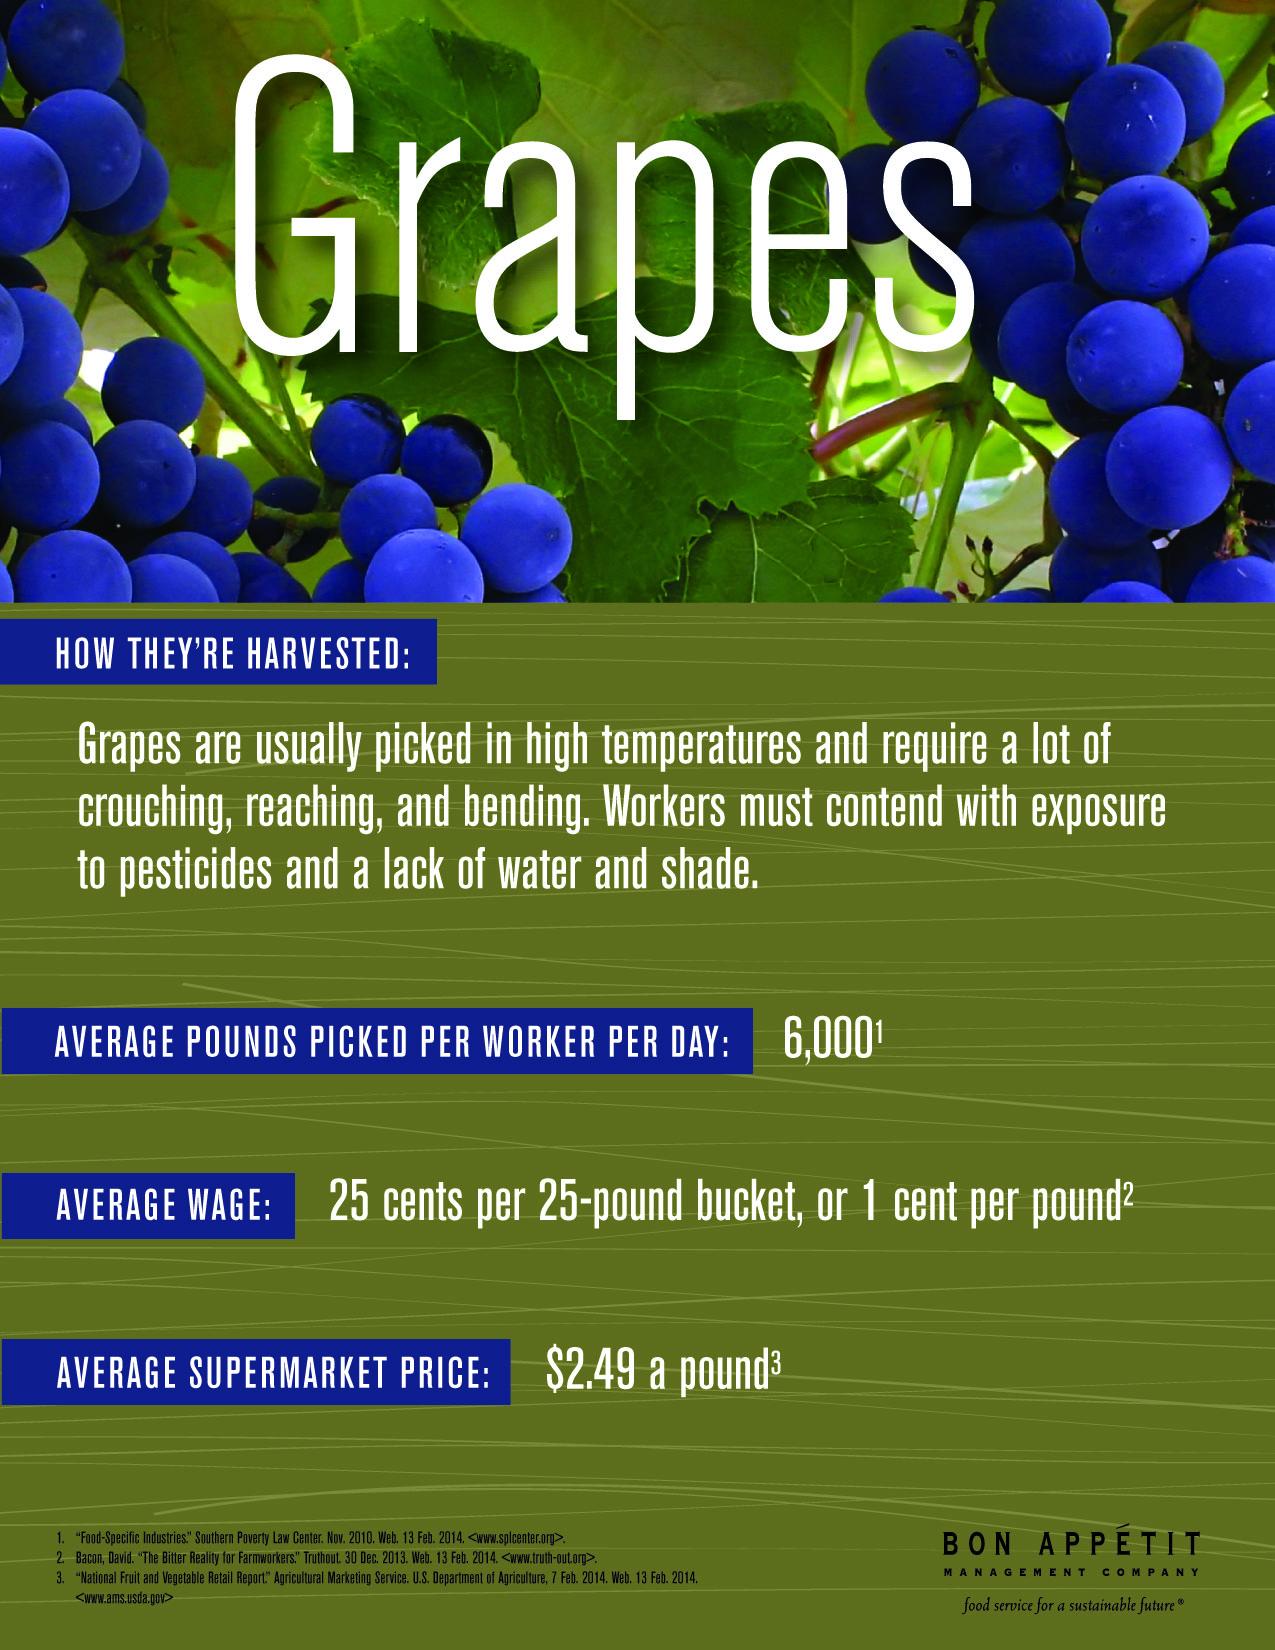 14-4621TableMini-Grapes4.jpg